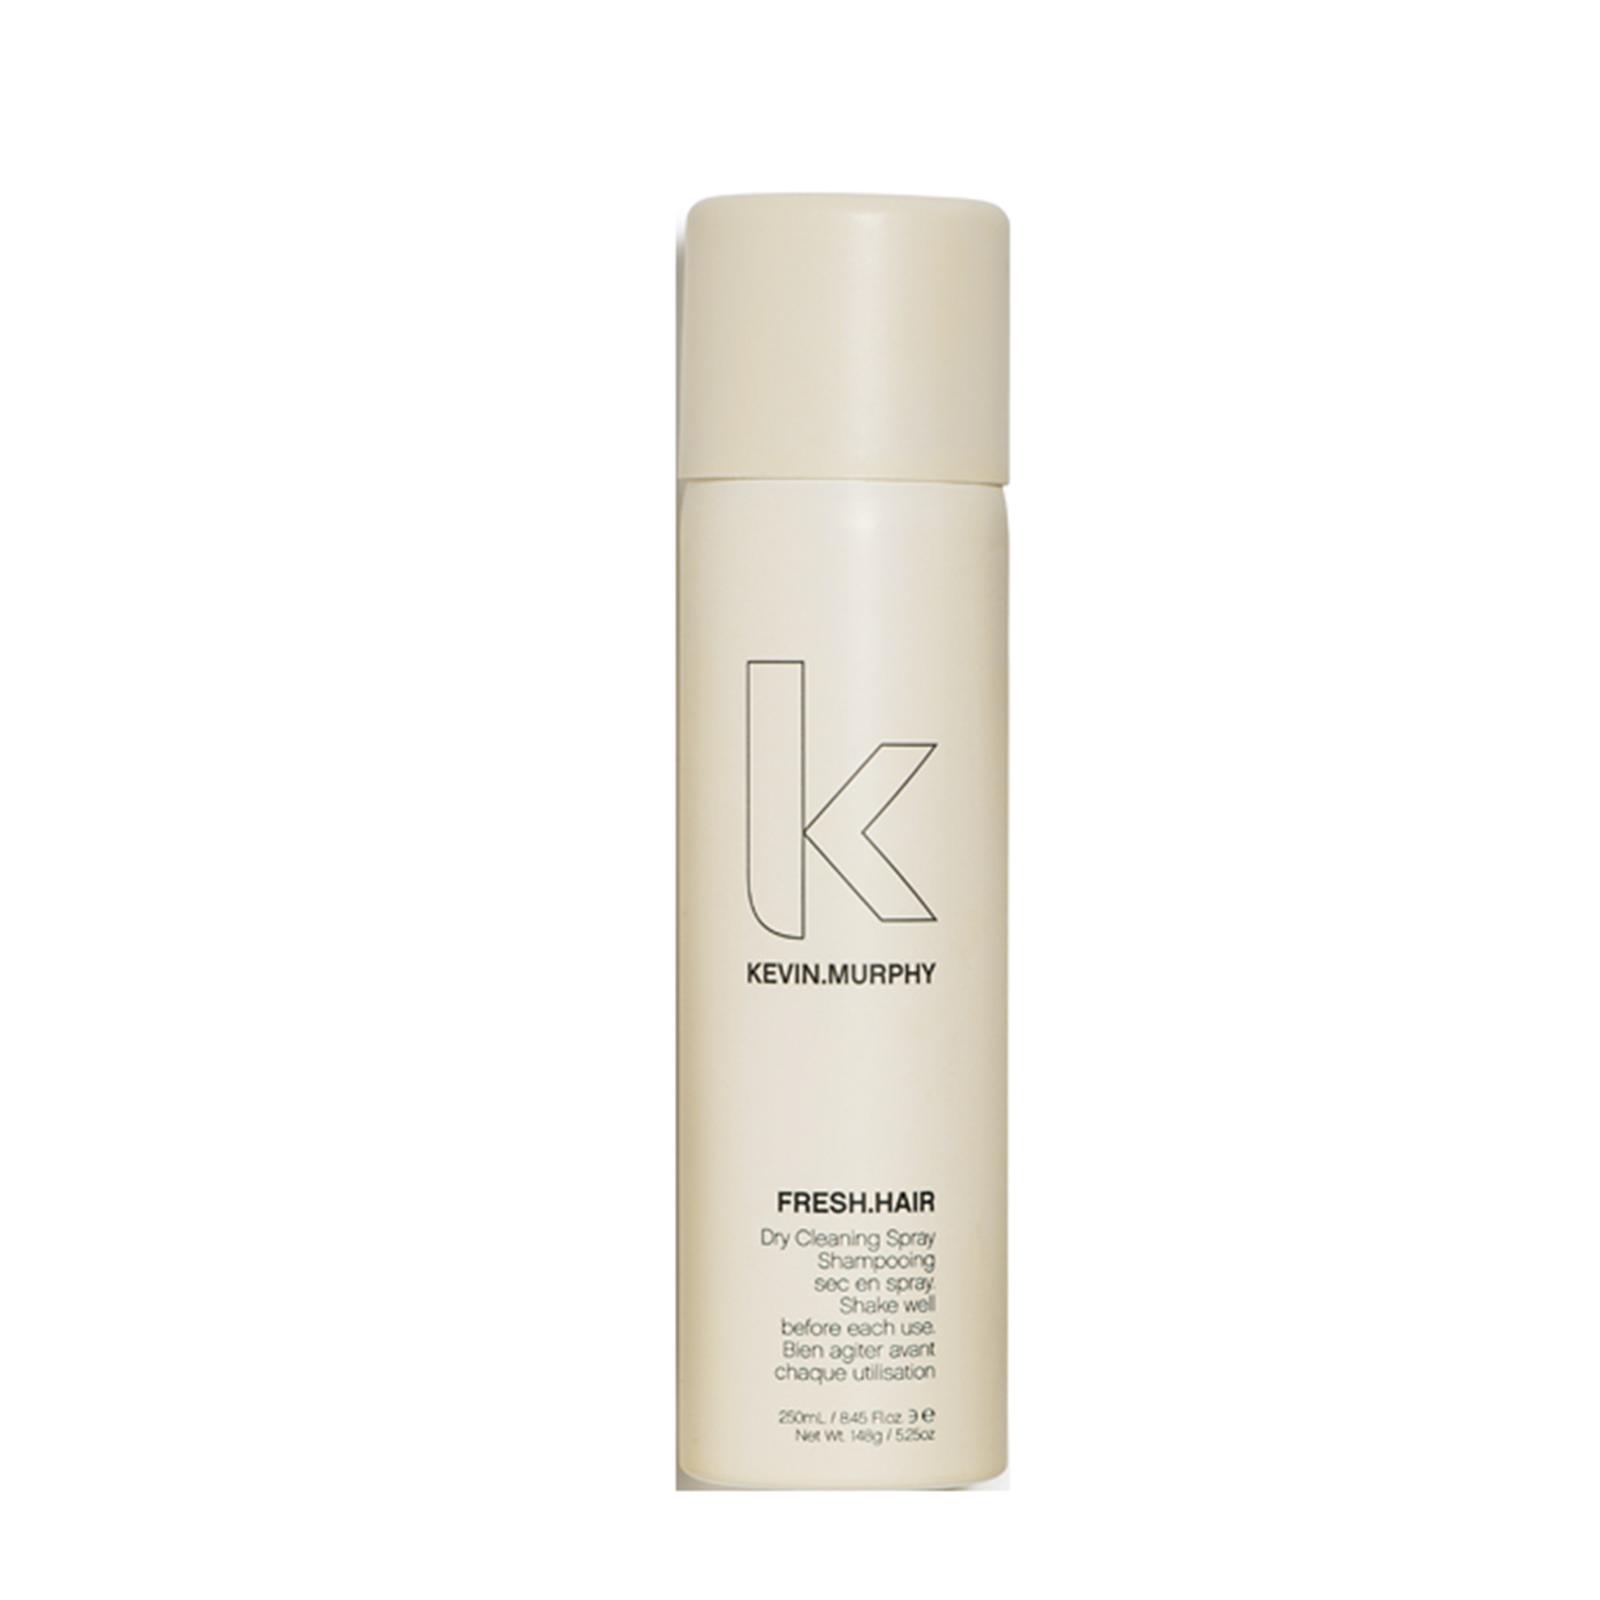 Tidssvarende Fresh Hair - Kevin Murphy | CosmoProf XM-43